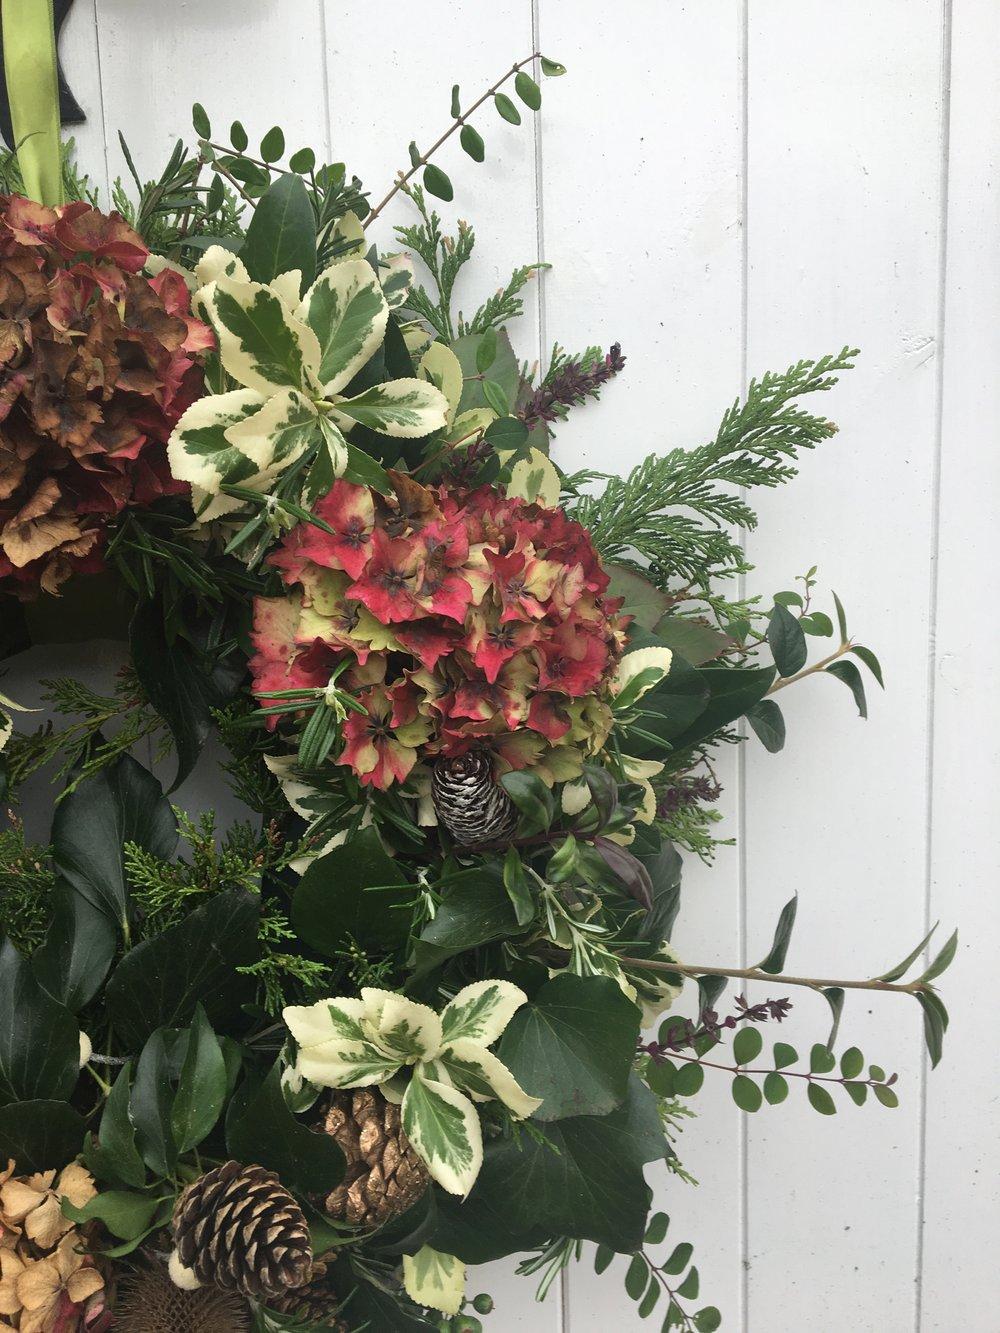 Image of Christmas Wreath Making Workshop